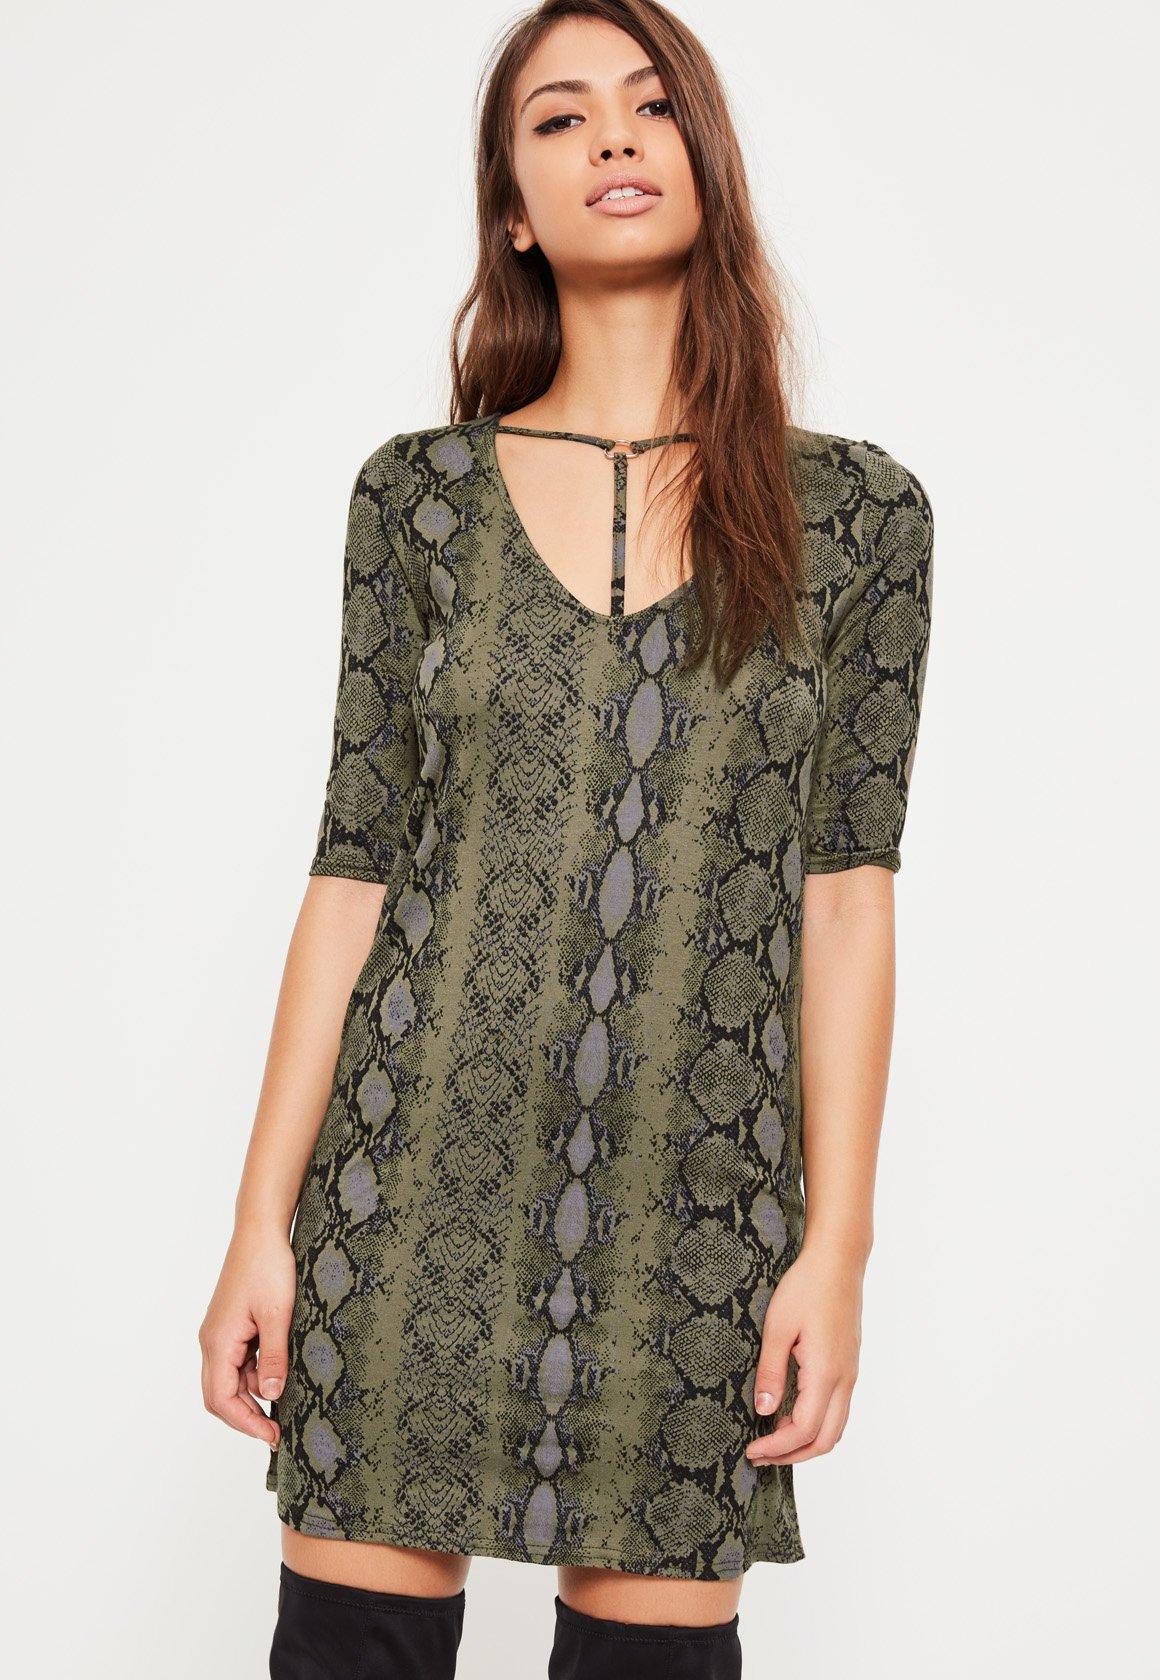 45e83850e3 Leopard Print Dress Shopstyle Uk   Saddha